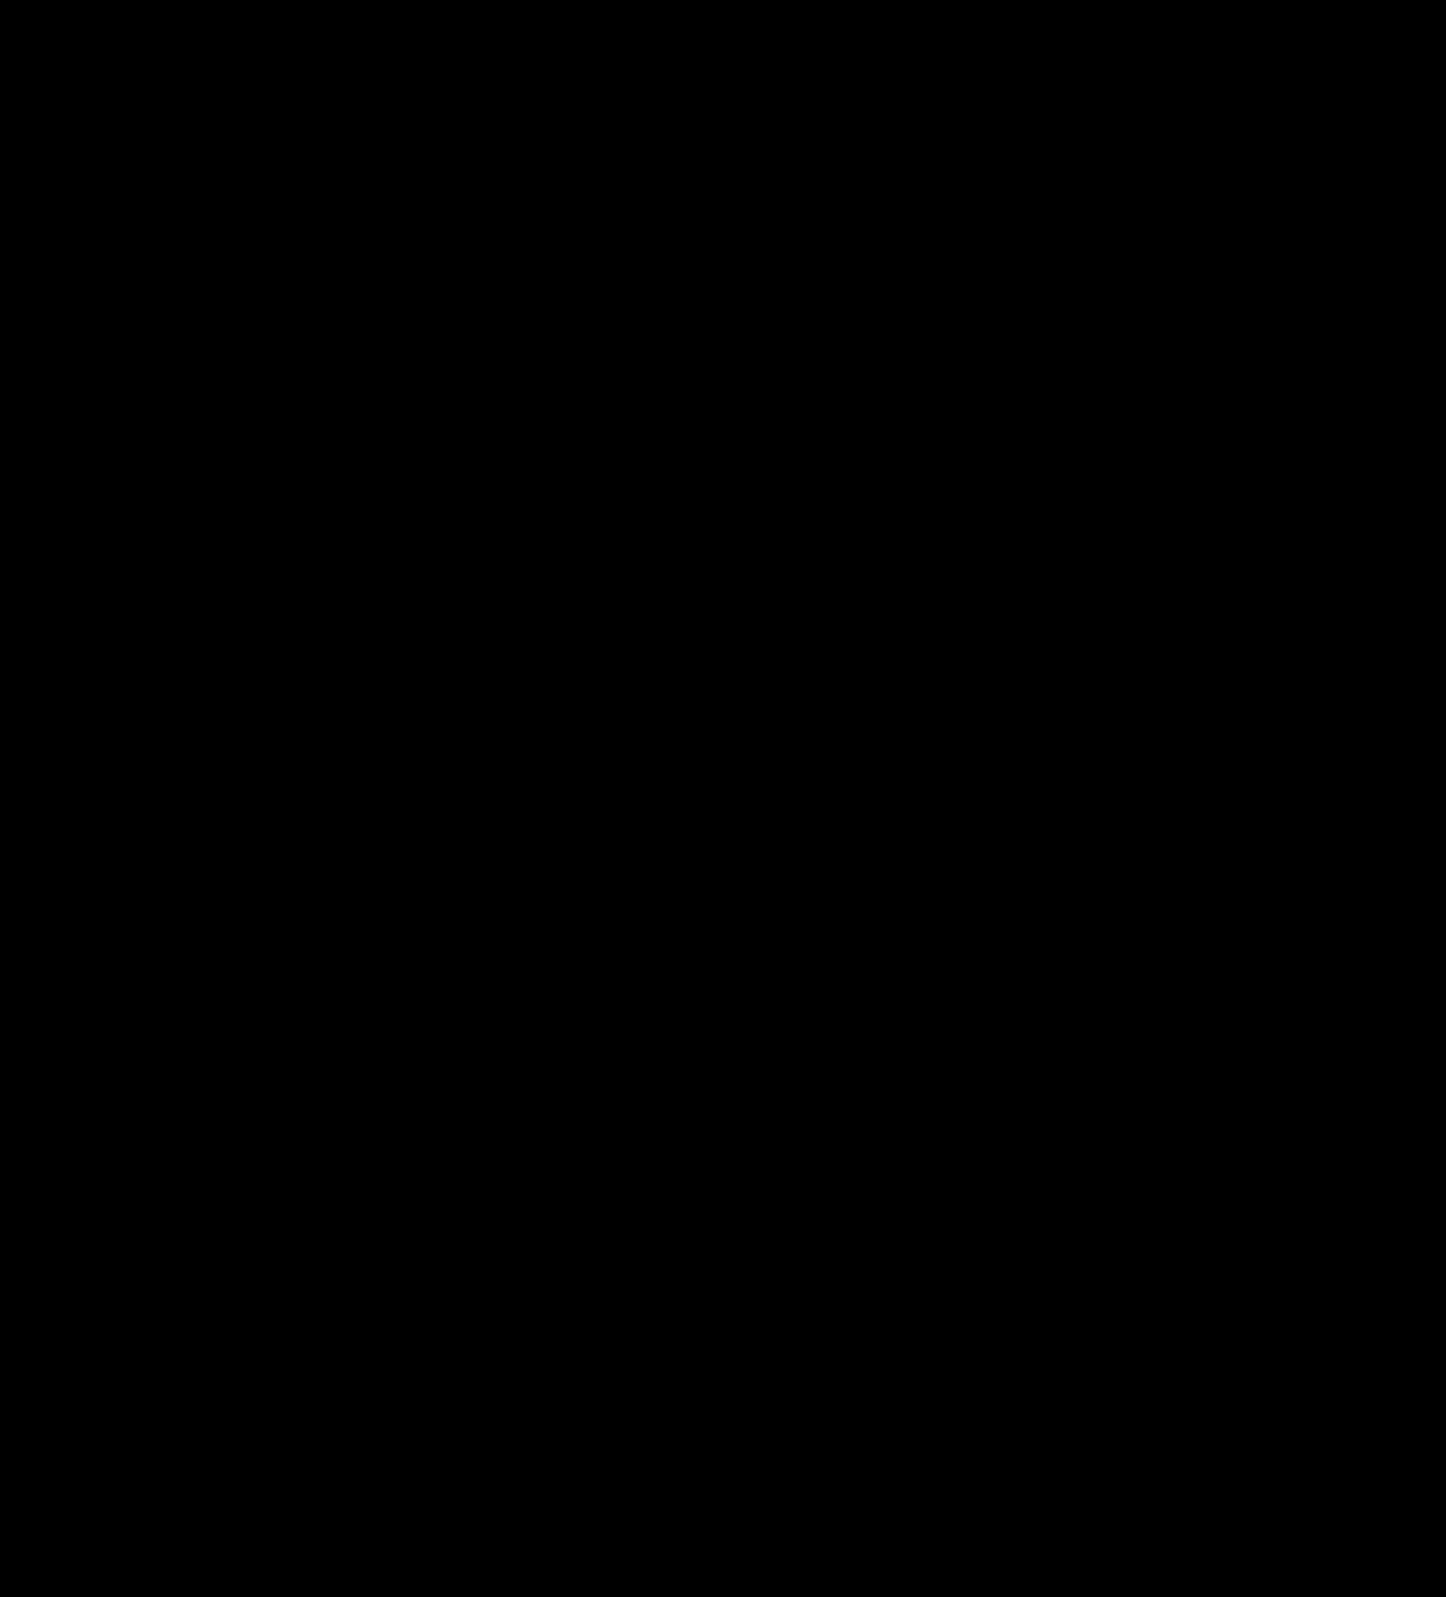 black transparent onlygfx. Smoke alpha png